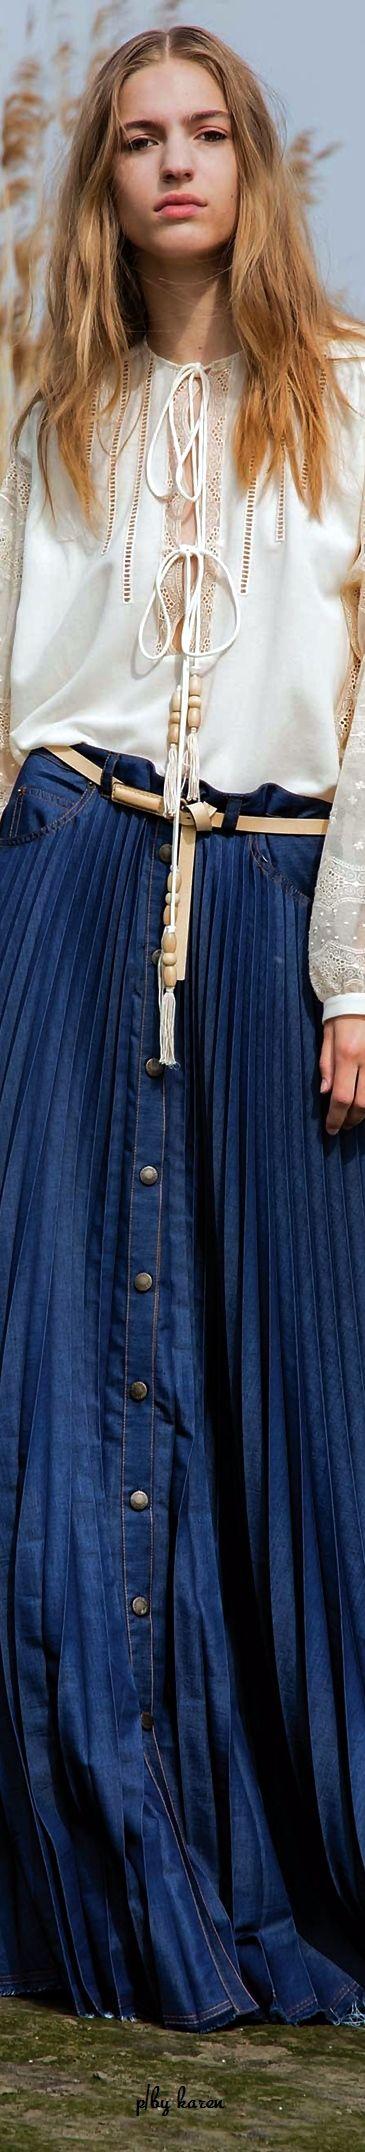 Diamond Cowgirl - Denim Skirt by Veronique Branquinho Resort 2017